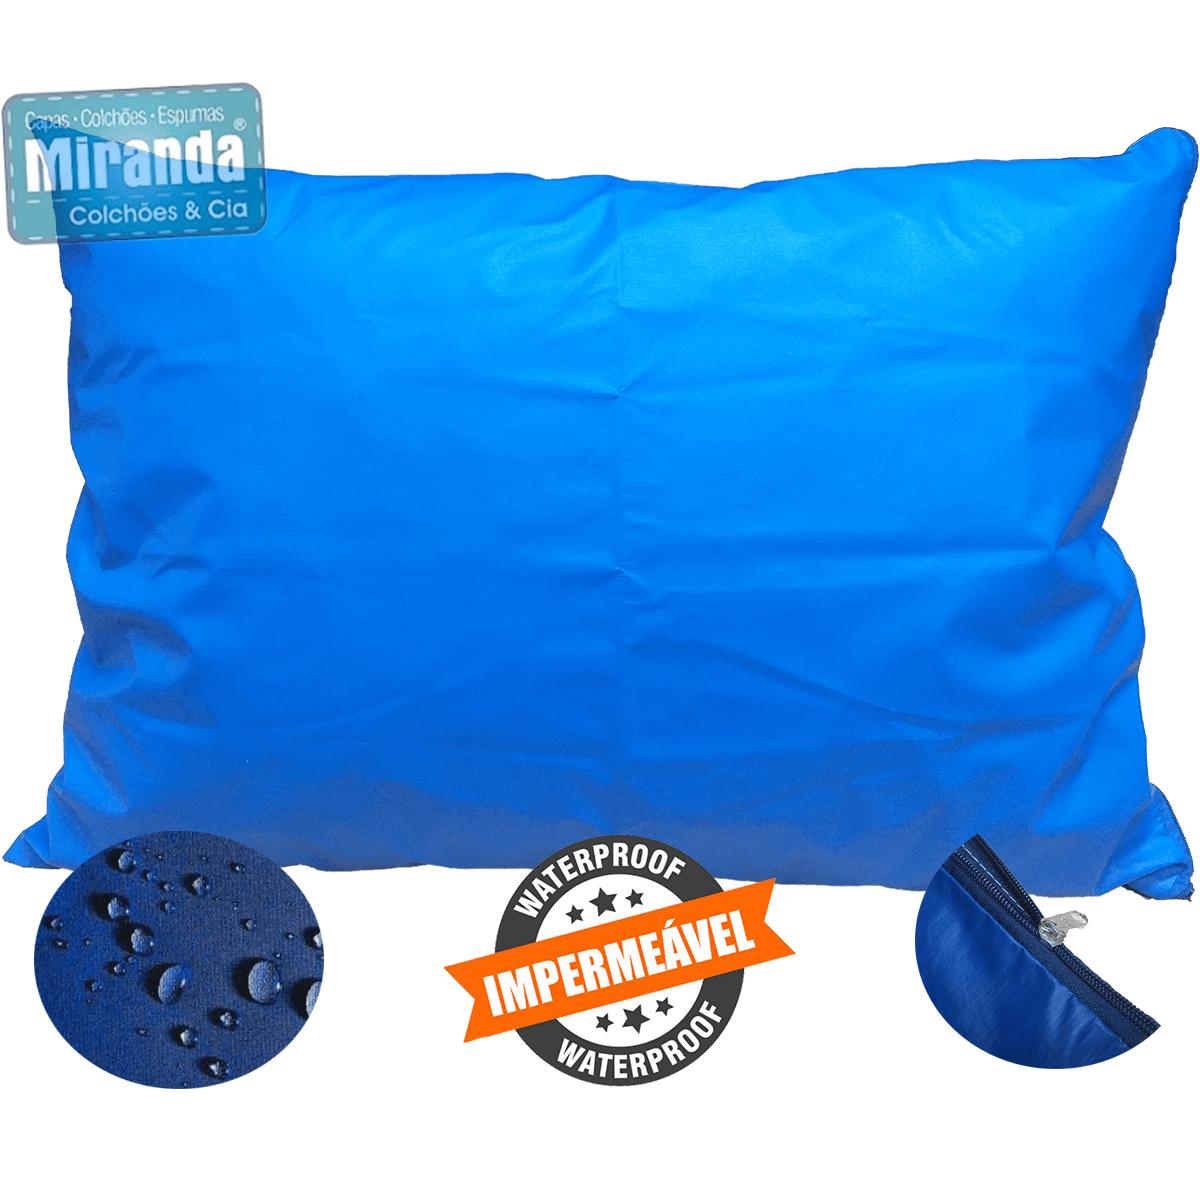 Kit 50 Capas Travesseiro 50 X 70 Hospitalar Impermeável azul  - Miranda Colchões